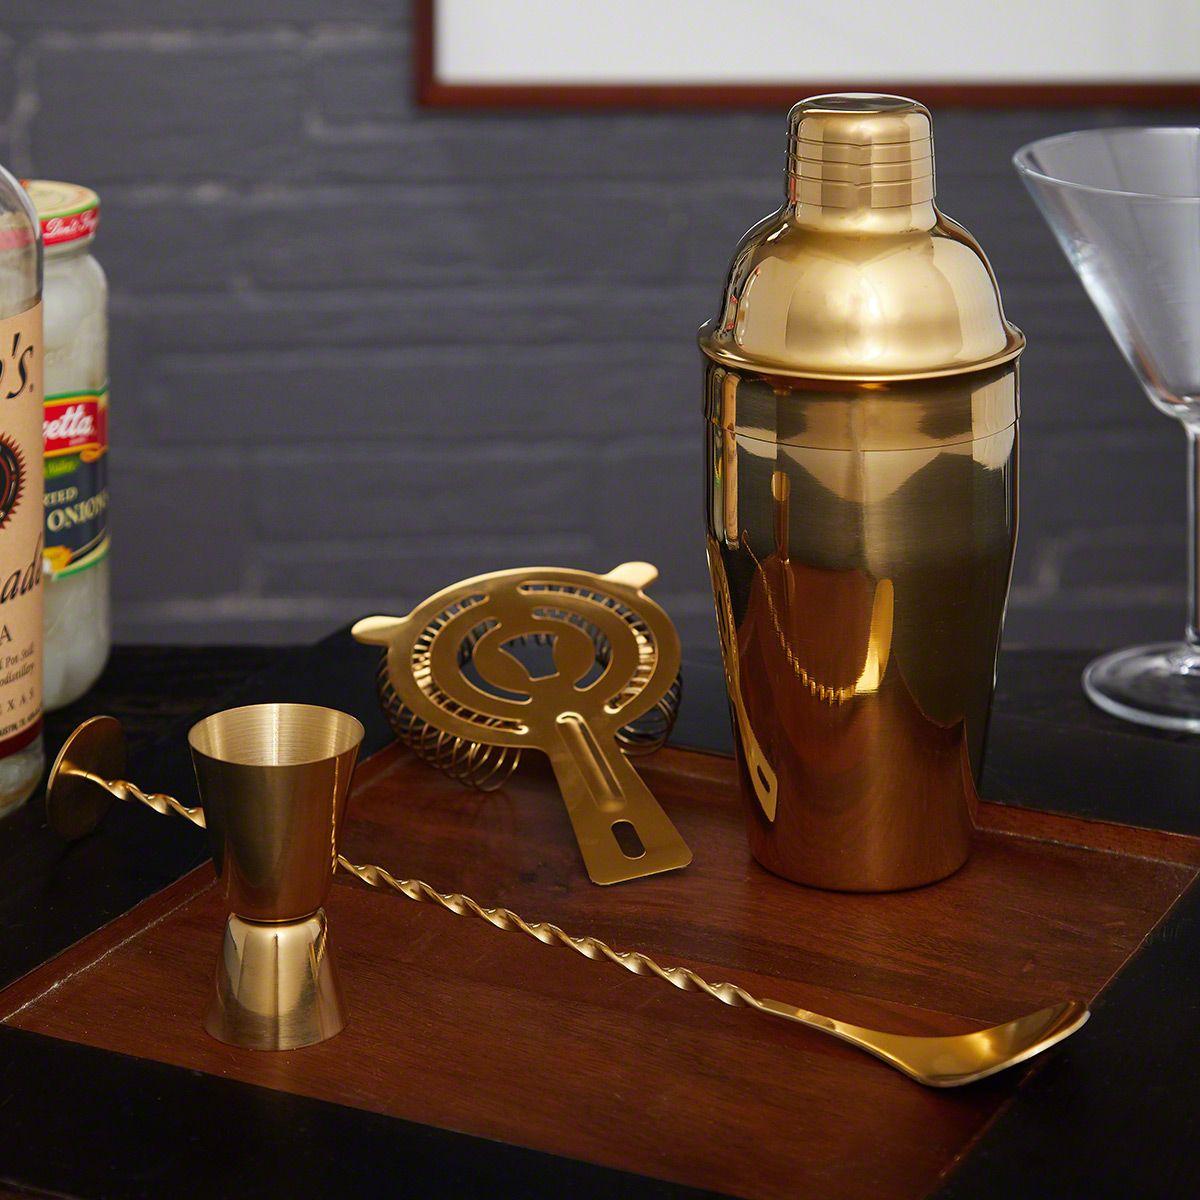 Ridgemont Gold Bar Tool Set and Cocktail Shaker (Engravable)